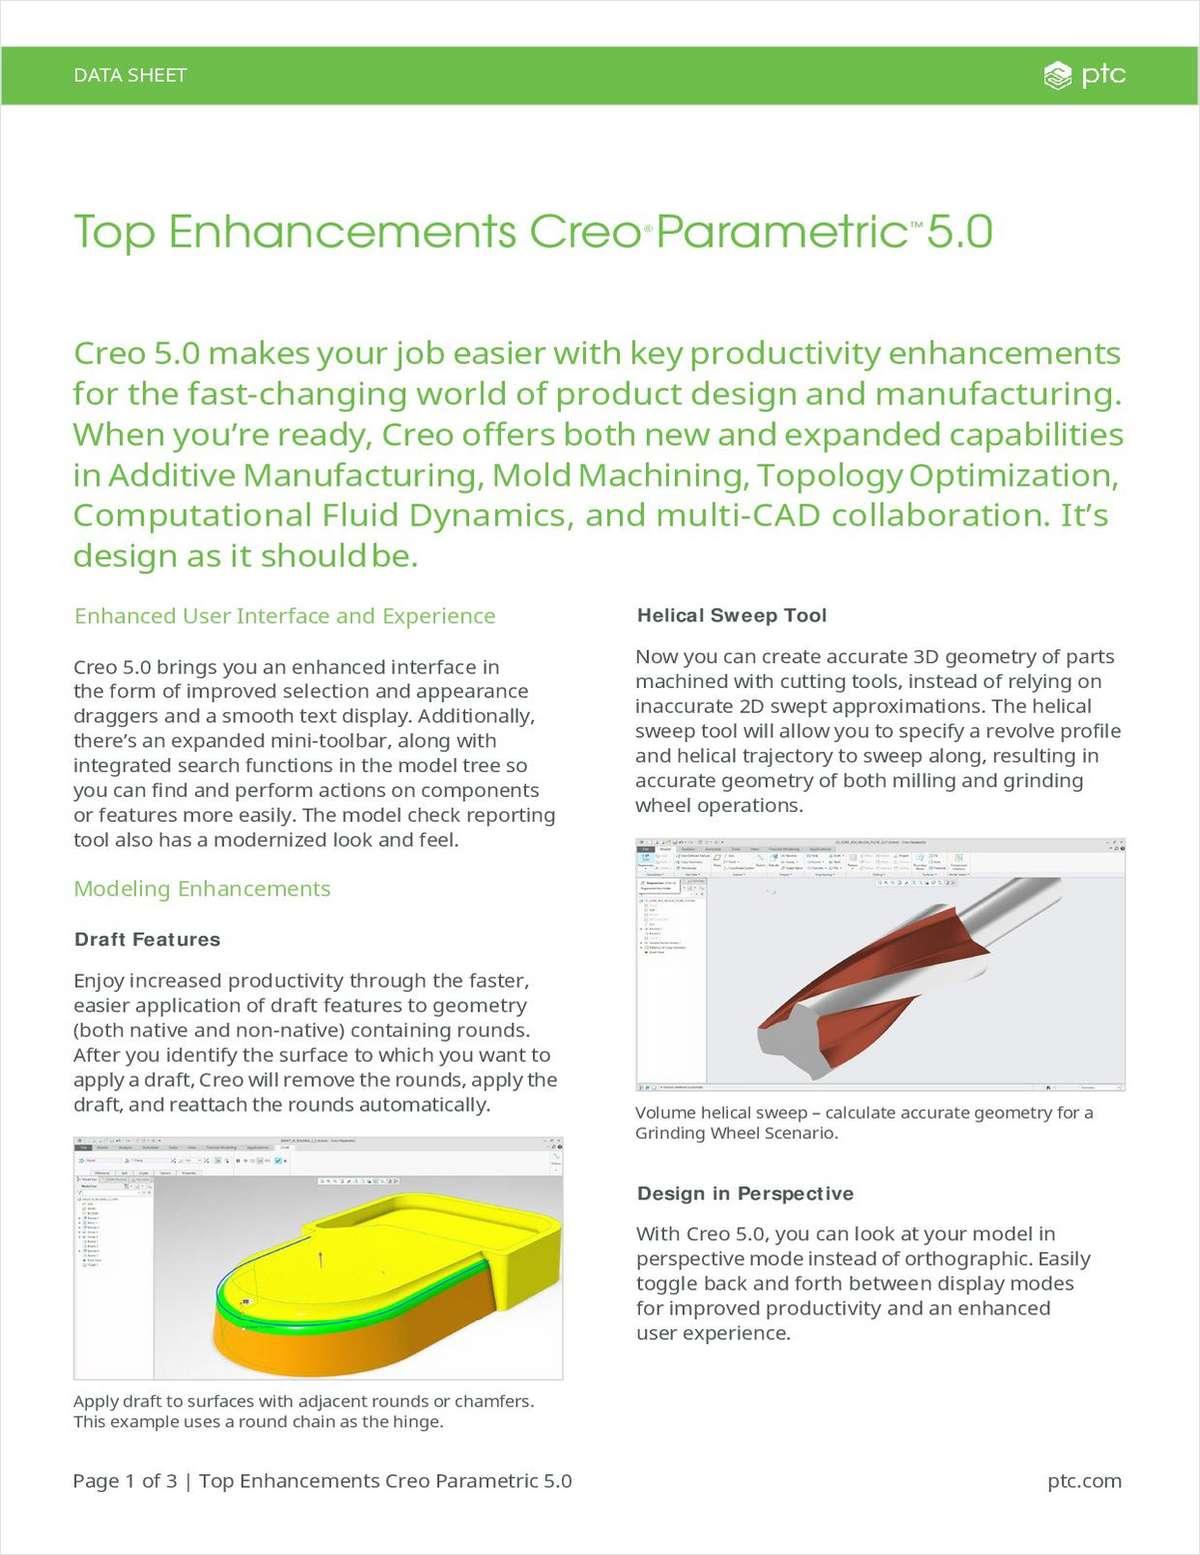 Top Enhancement in Creo Parametric 5.0